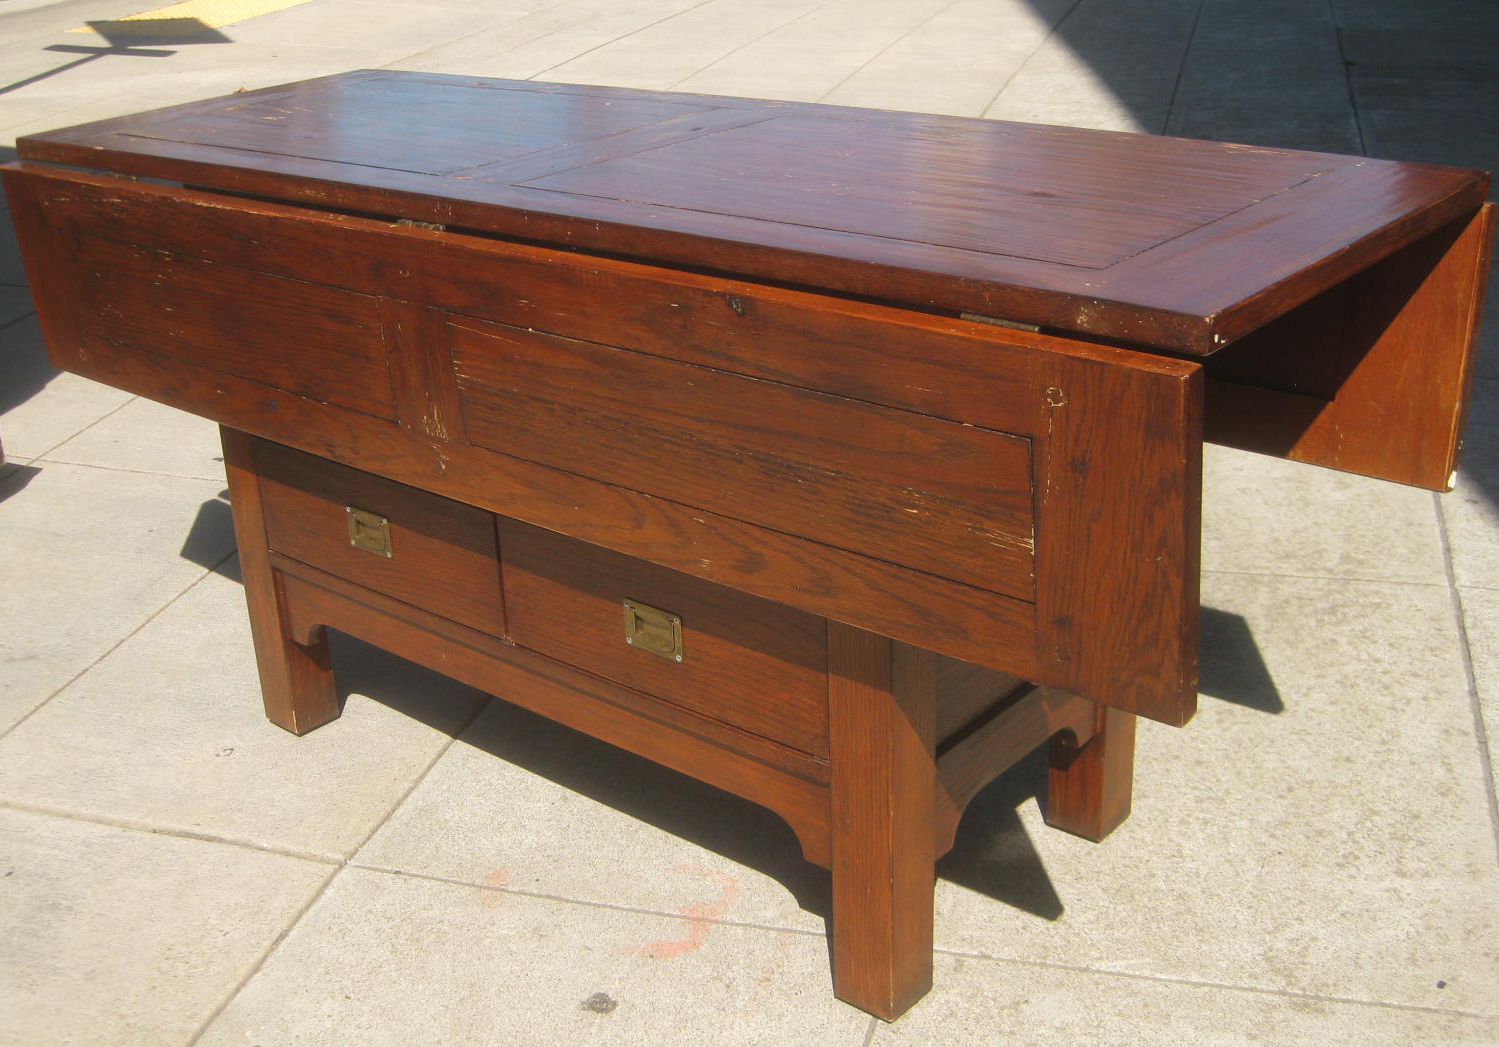 Uhuru Furniture Collectibles Antique Dining Uhuru Furniture Collectibles September 2012